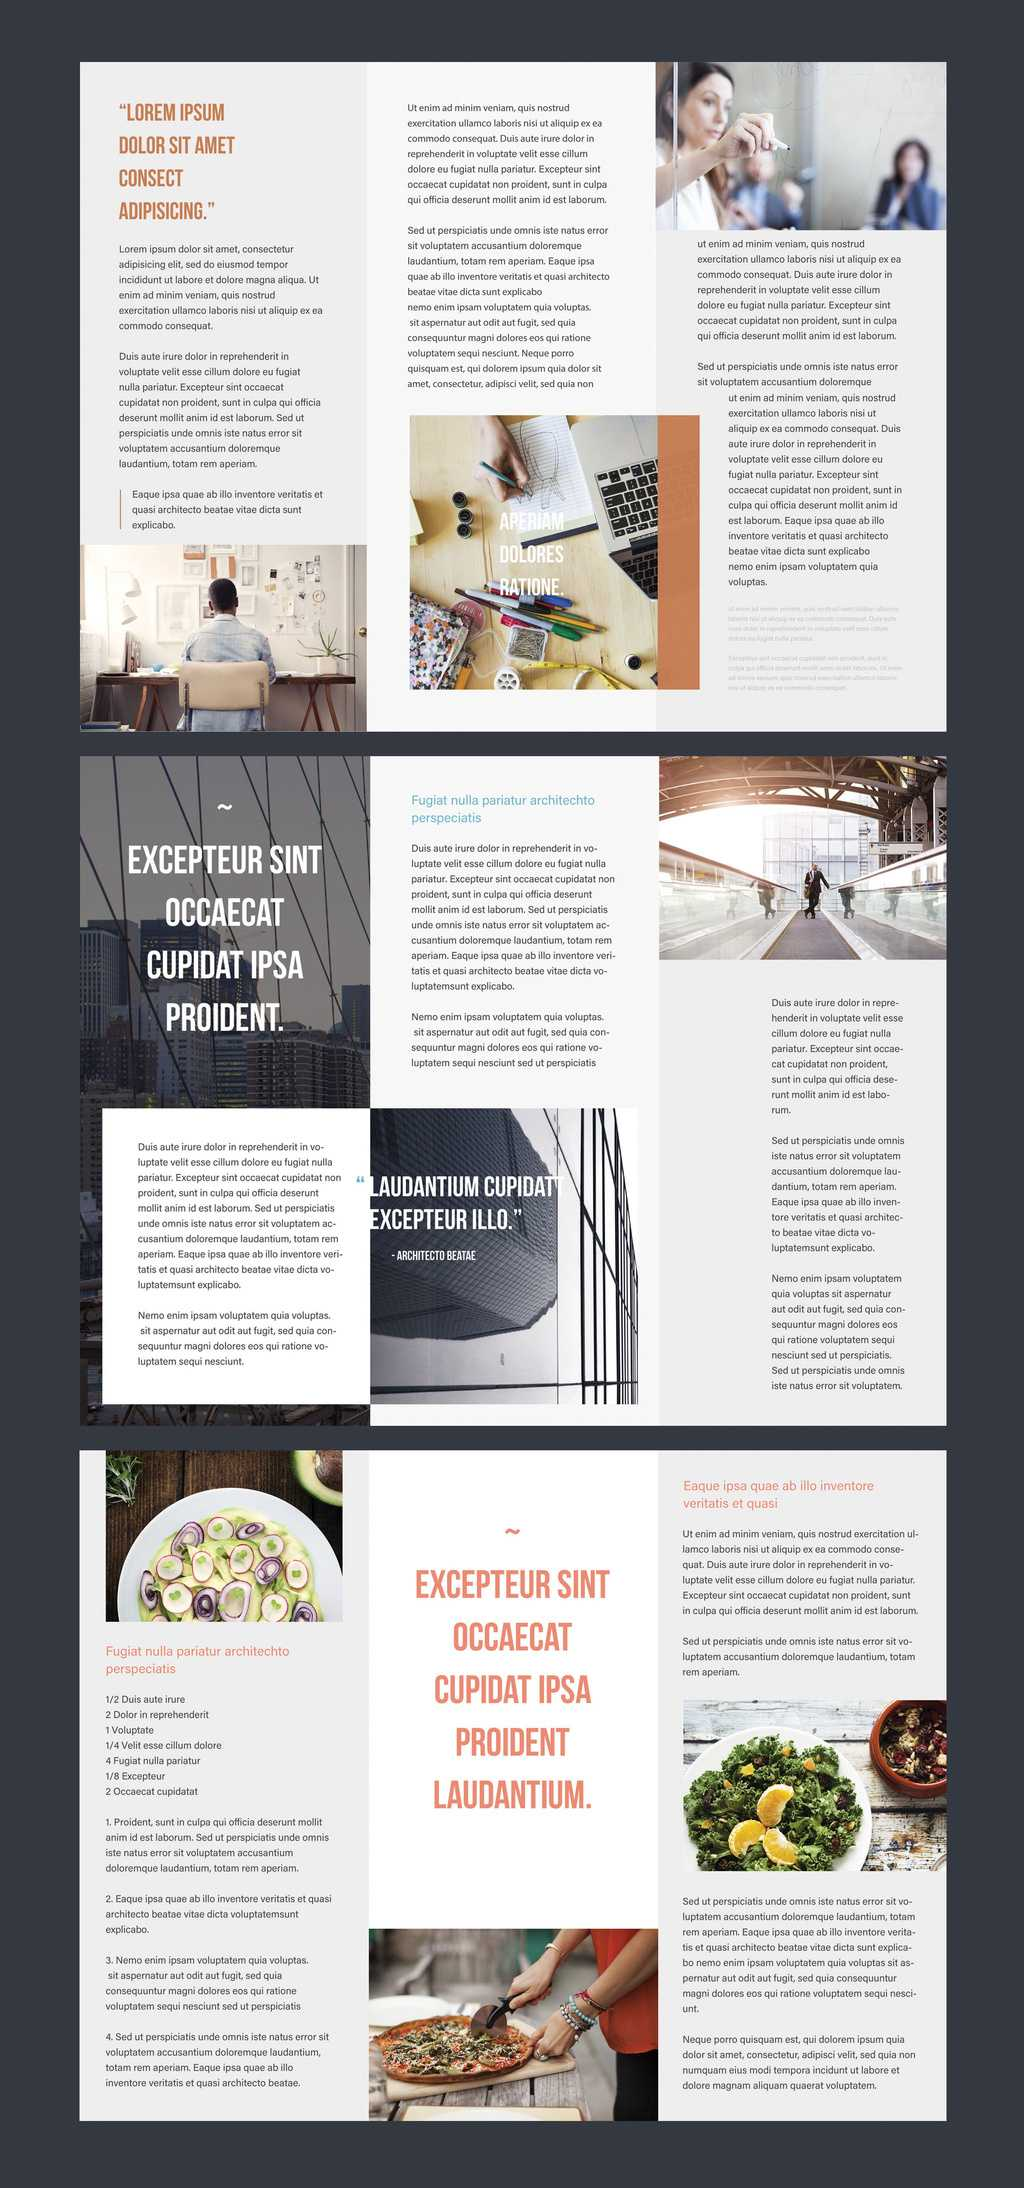 Professional Brochure Templates | Adobe Blog With Regard To Brochure Templates Adobe Illustrator